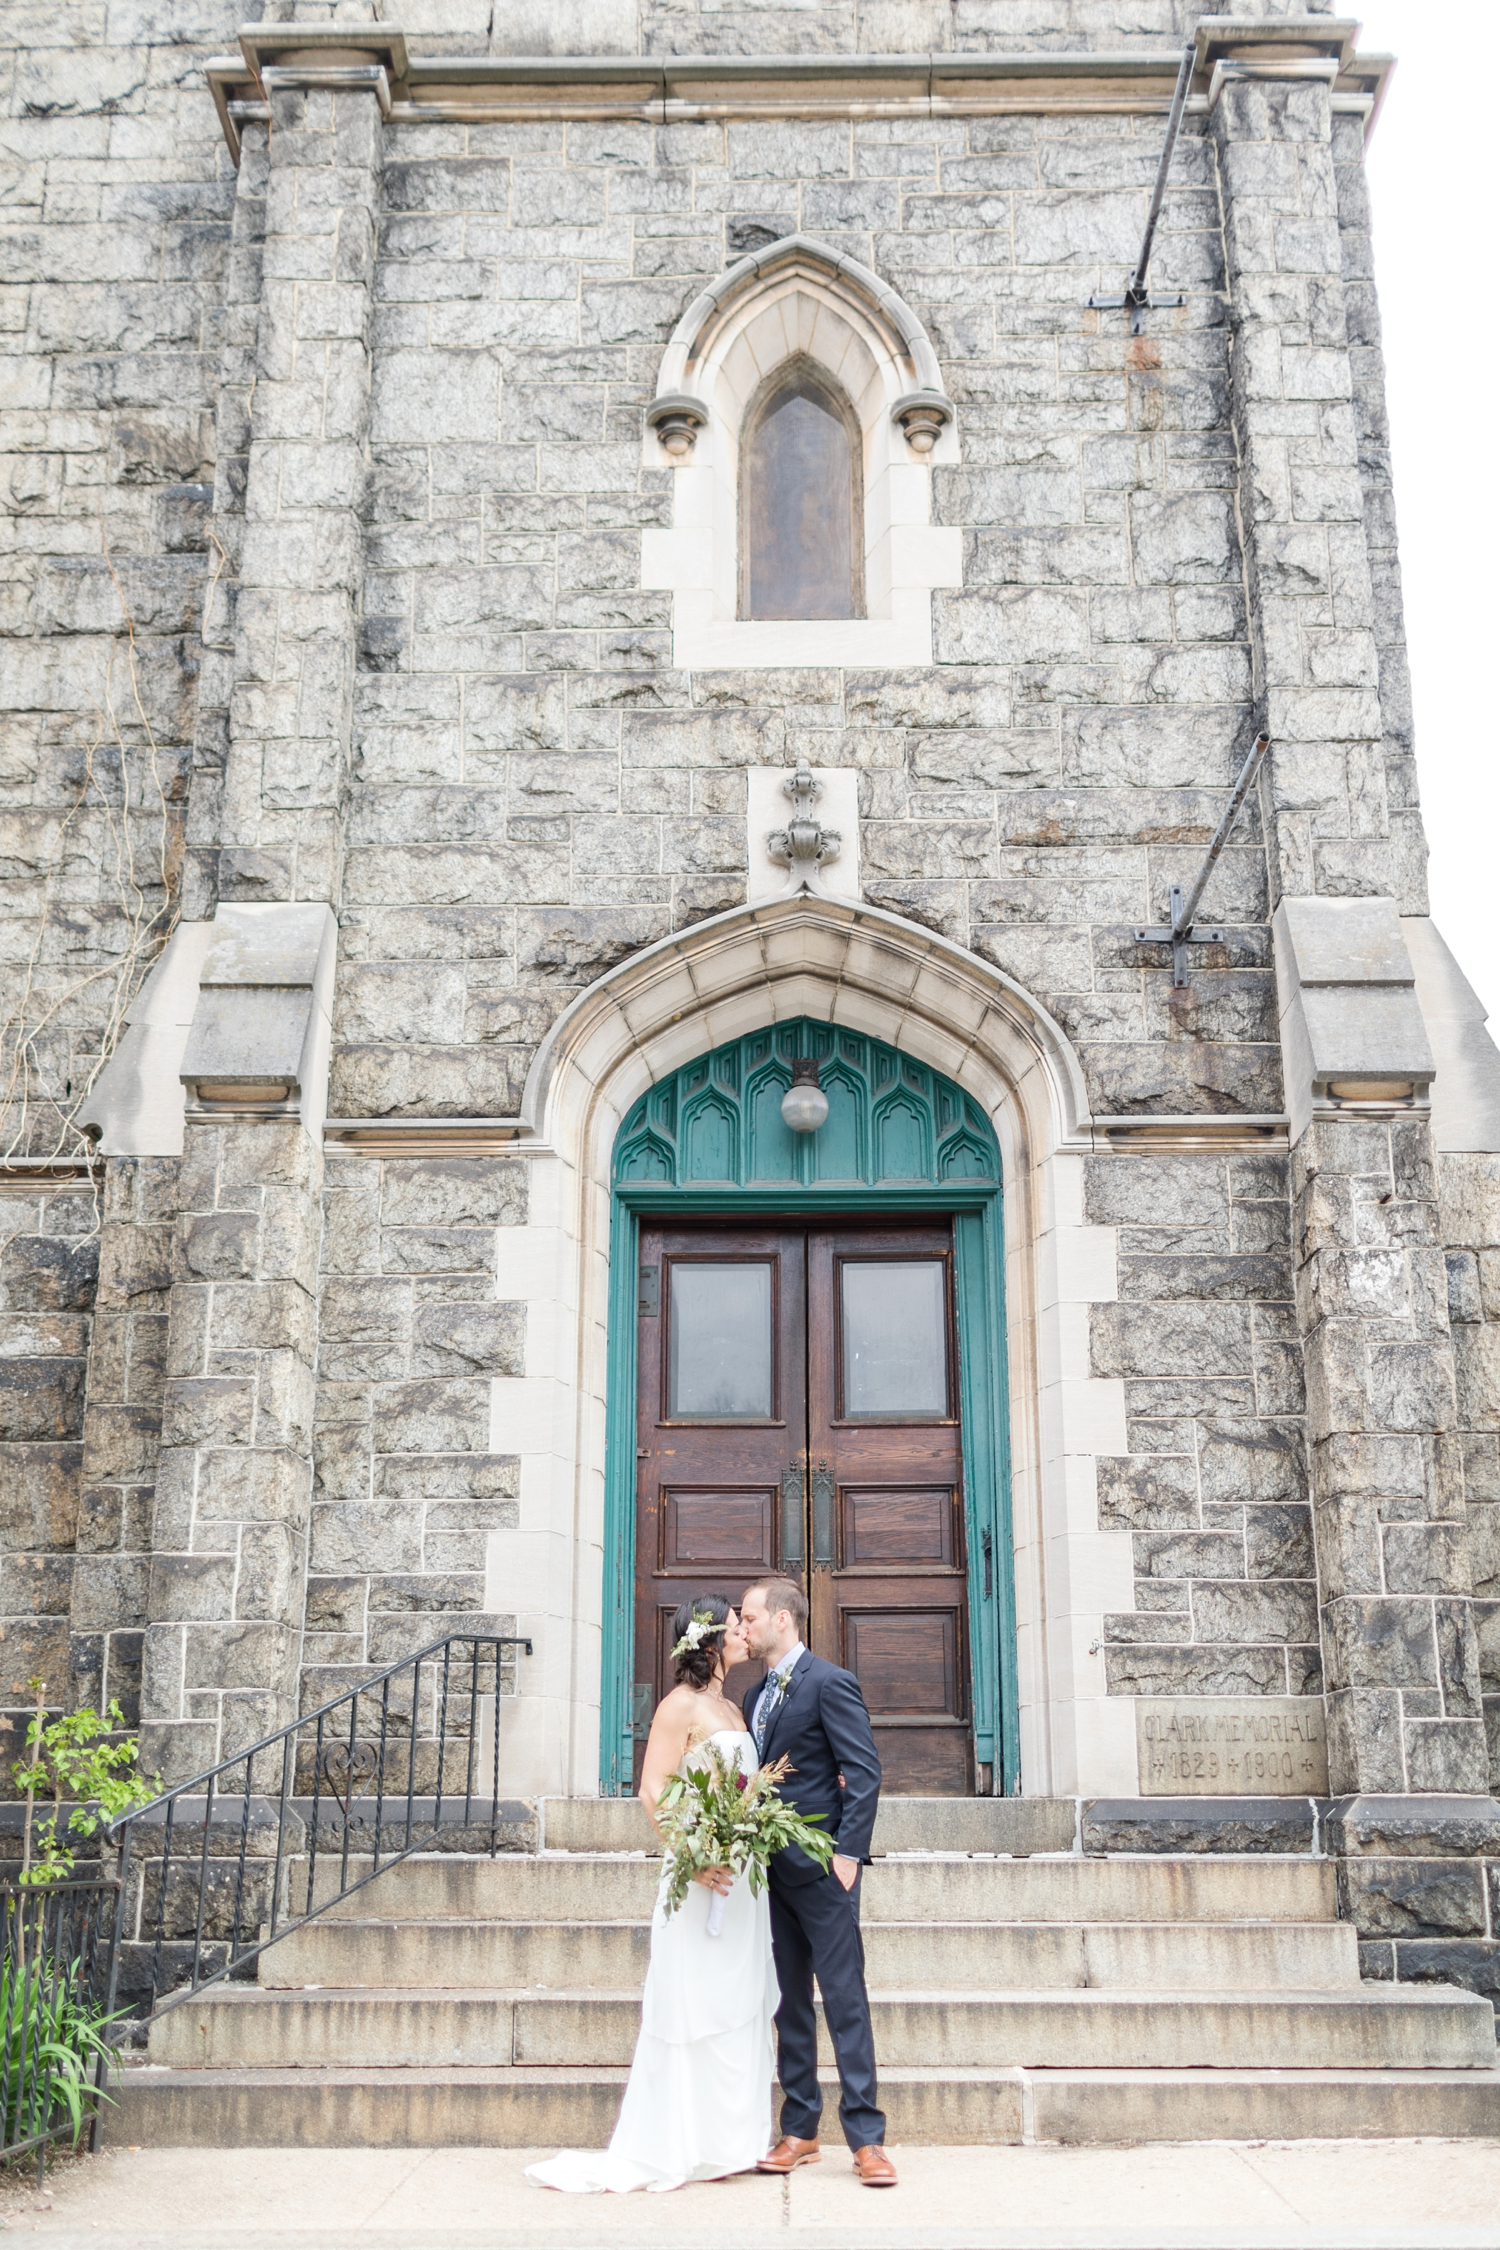 Matt & Angel Skarzynski Wedding WEDDING HIGHLIGHTS-162_2640-Space-wedding-Baltimore-Maryland-wedding-photographer-Patapsco-State-Park-engagement-anna-grace-photography-photo.jpg